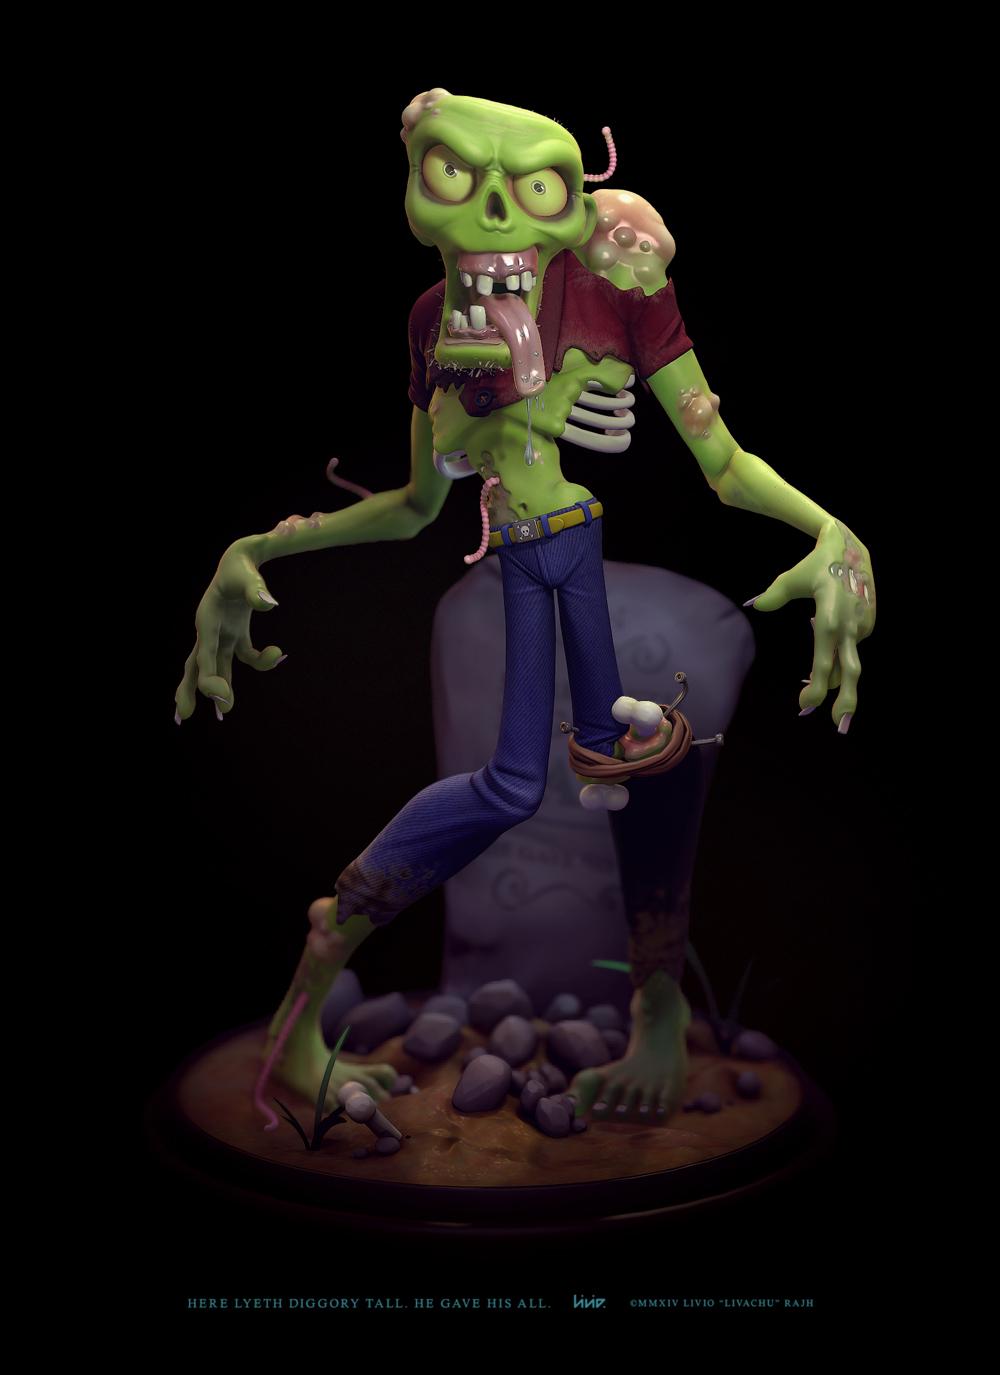 Livachu zombie diggory tall 1 e8cb3309 27rq